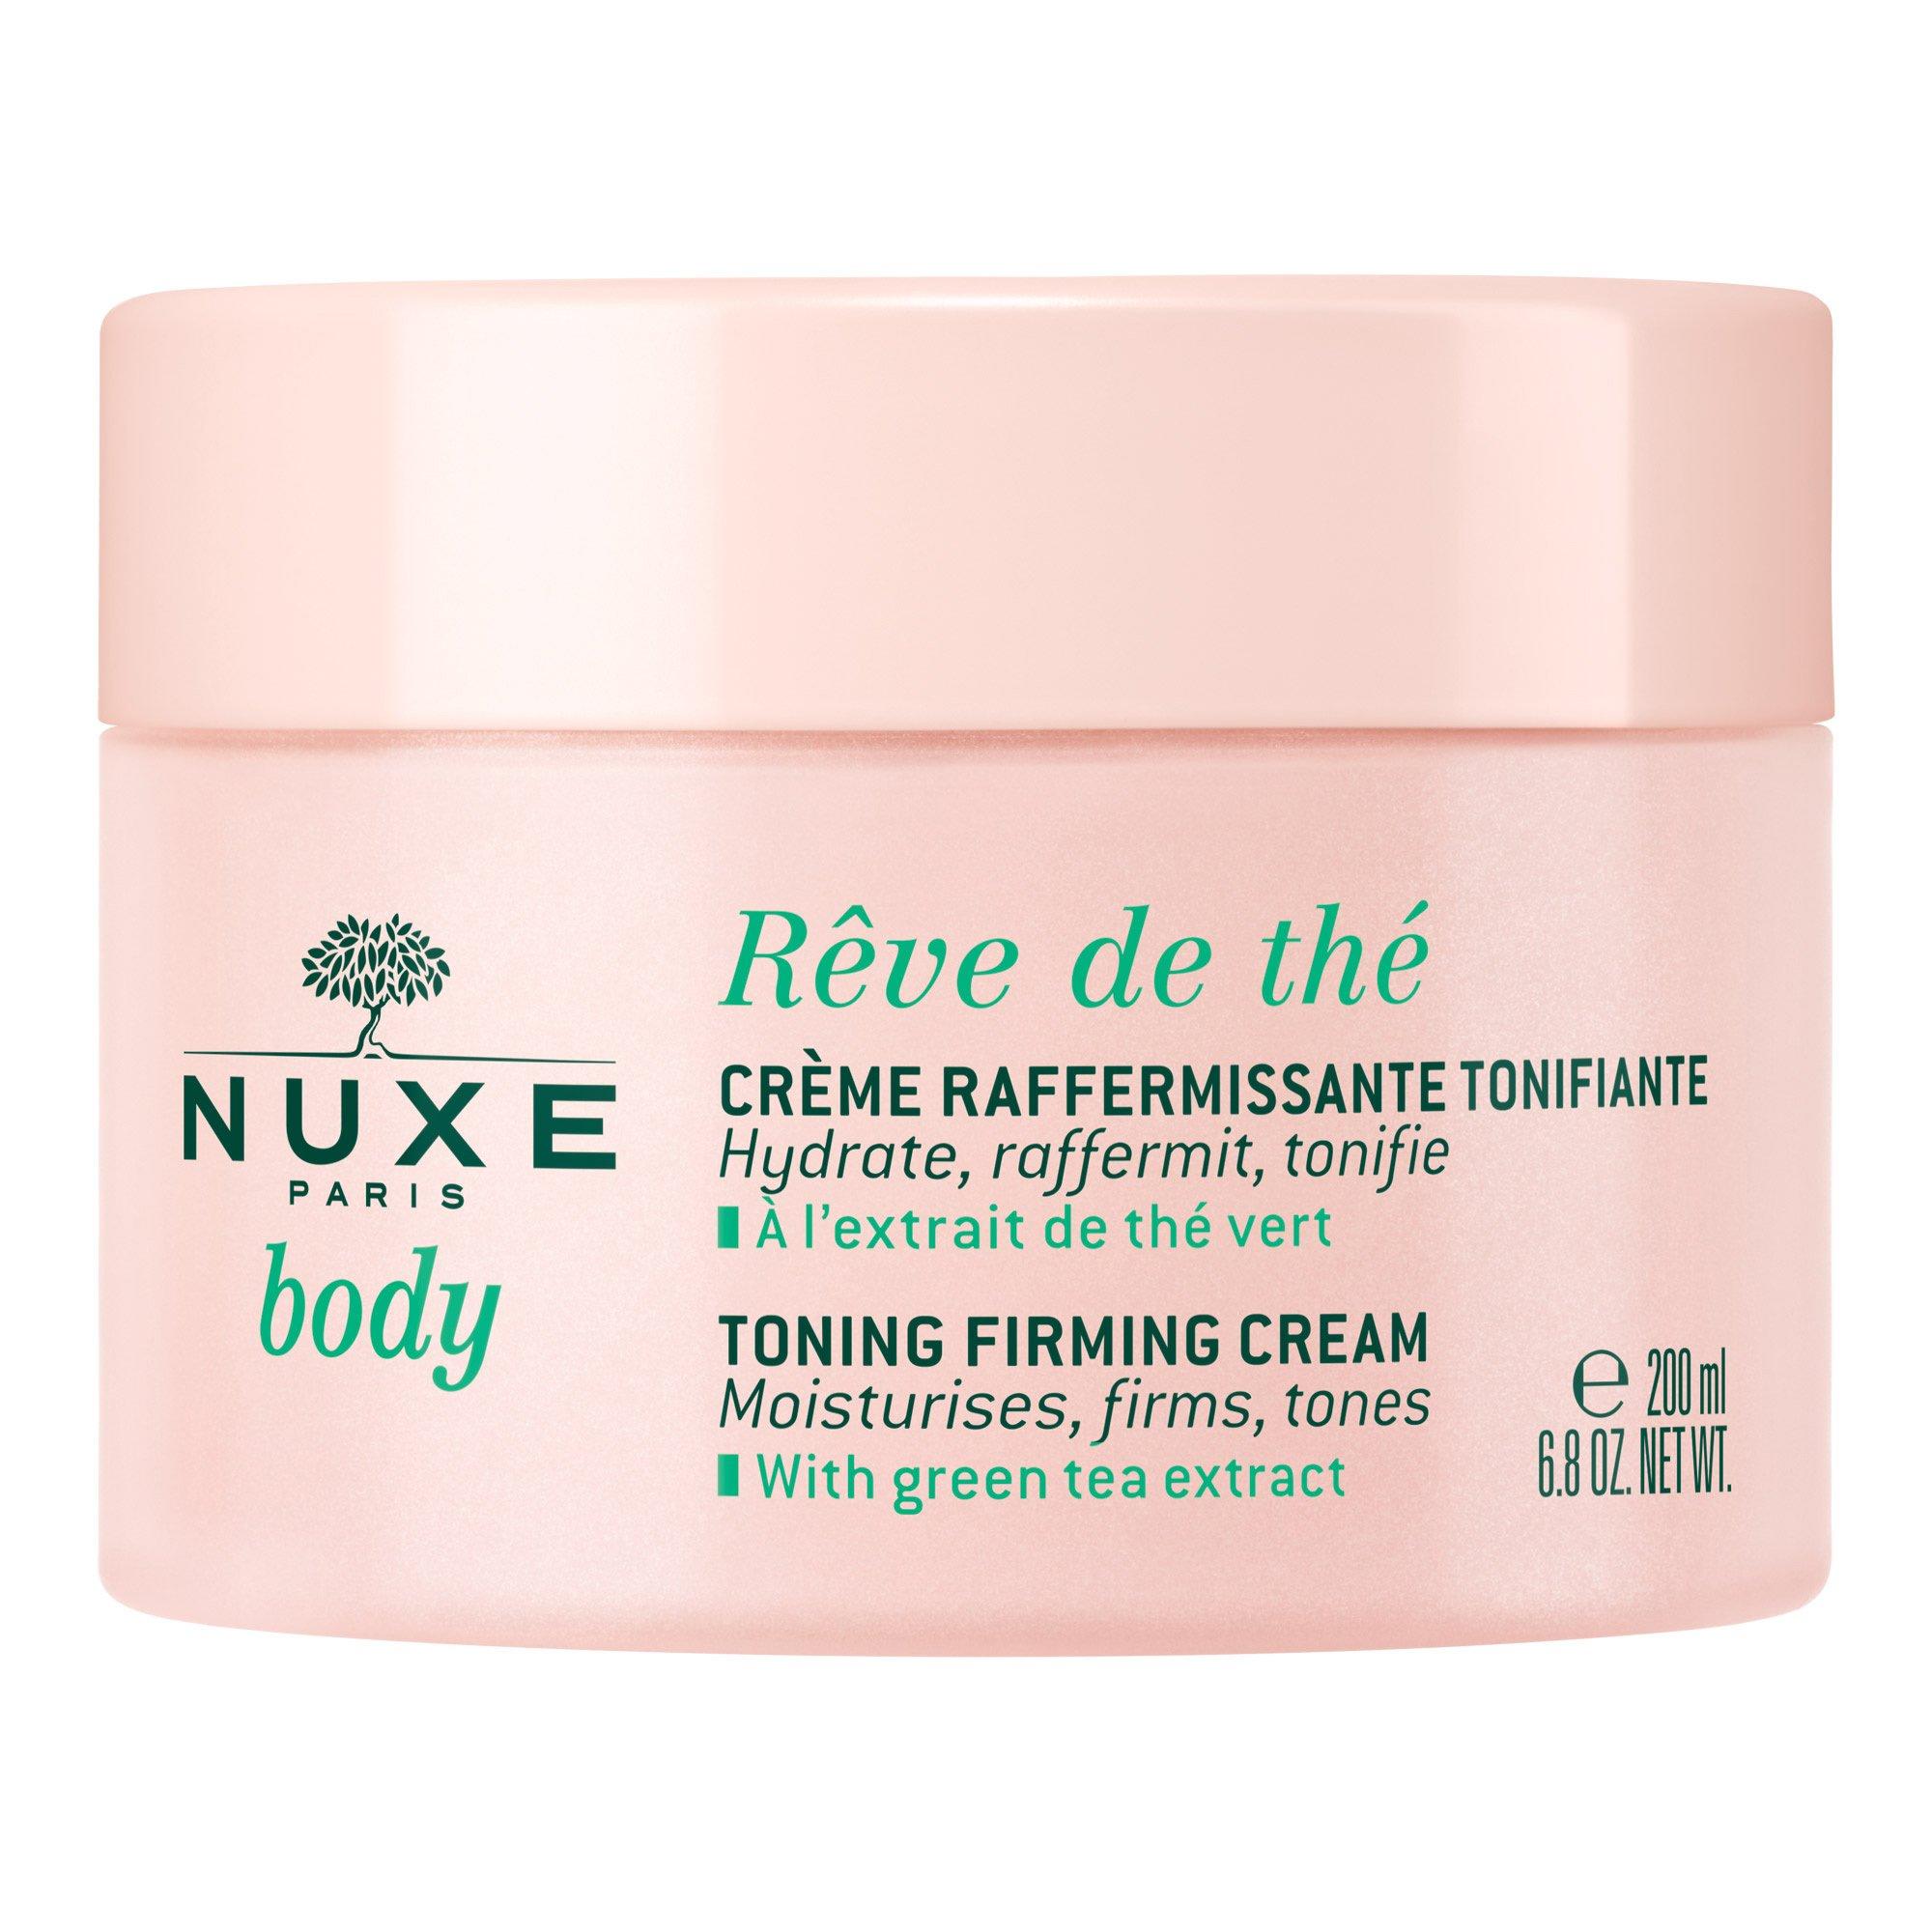 Nuxe Body Reve de The Moisturising Toning Firming Cream Ενυδατική Κρέμα Σύσφιξης Σώματος με Πράσινο Τσάι 200ml